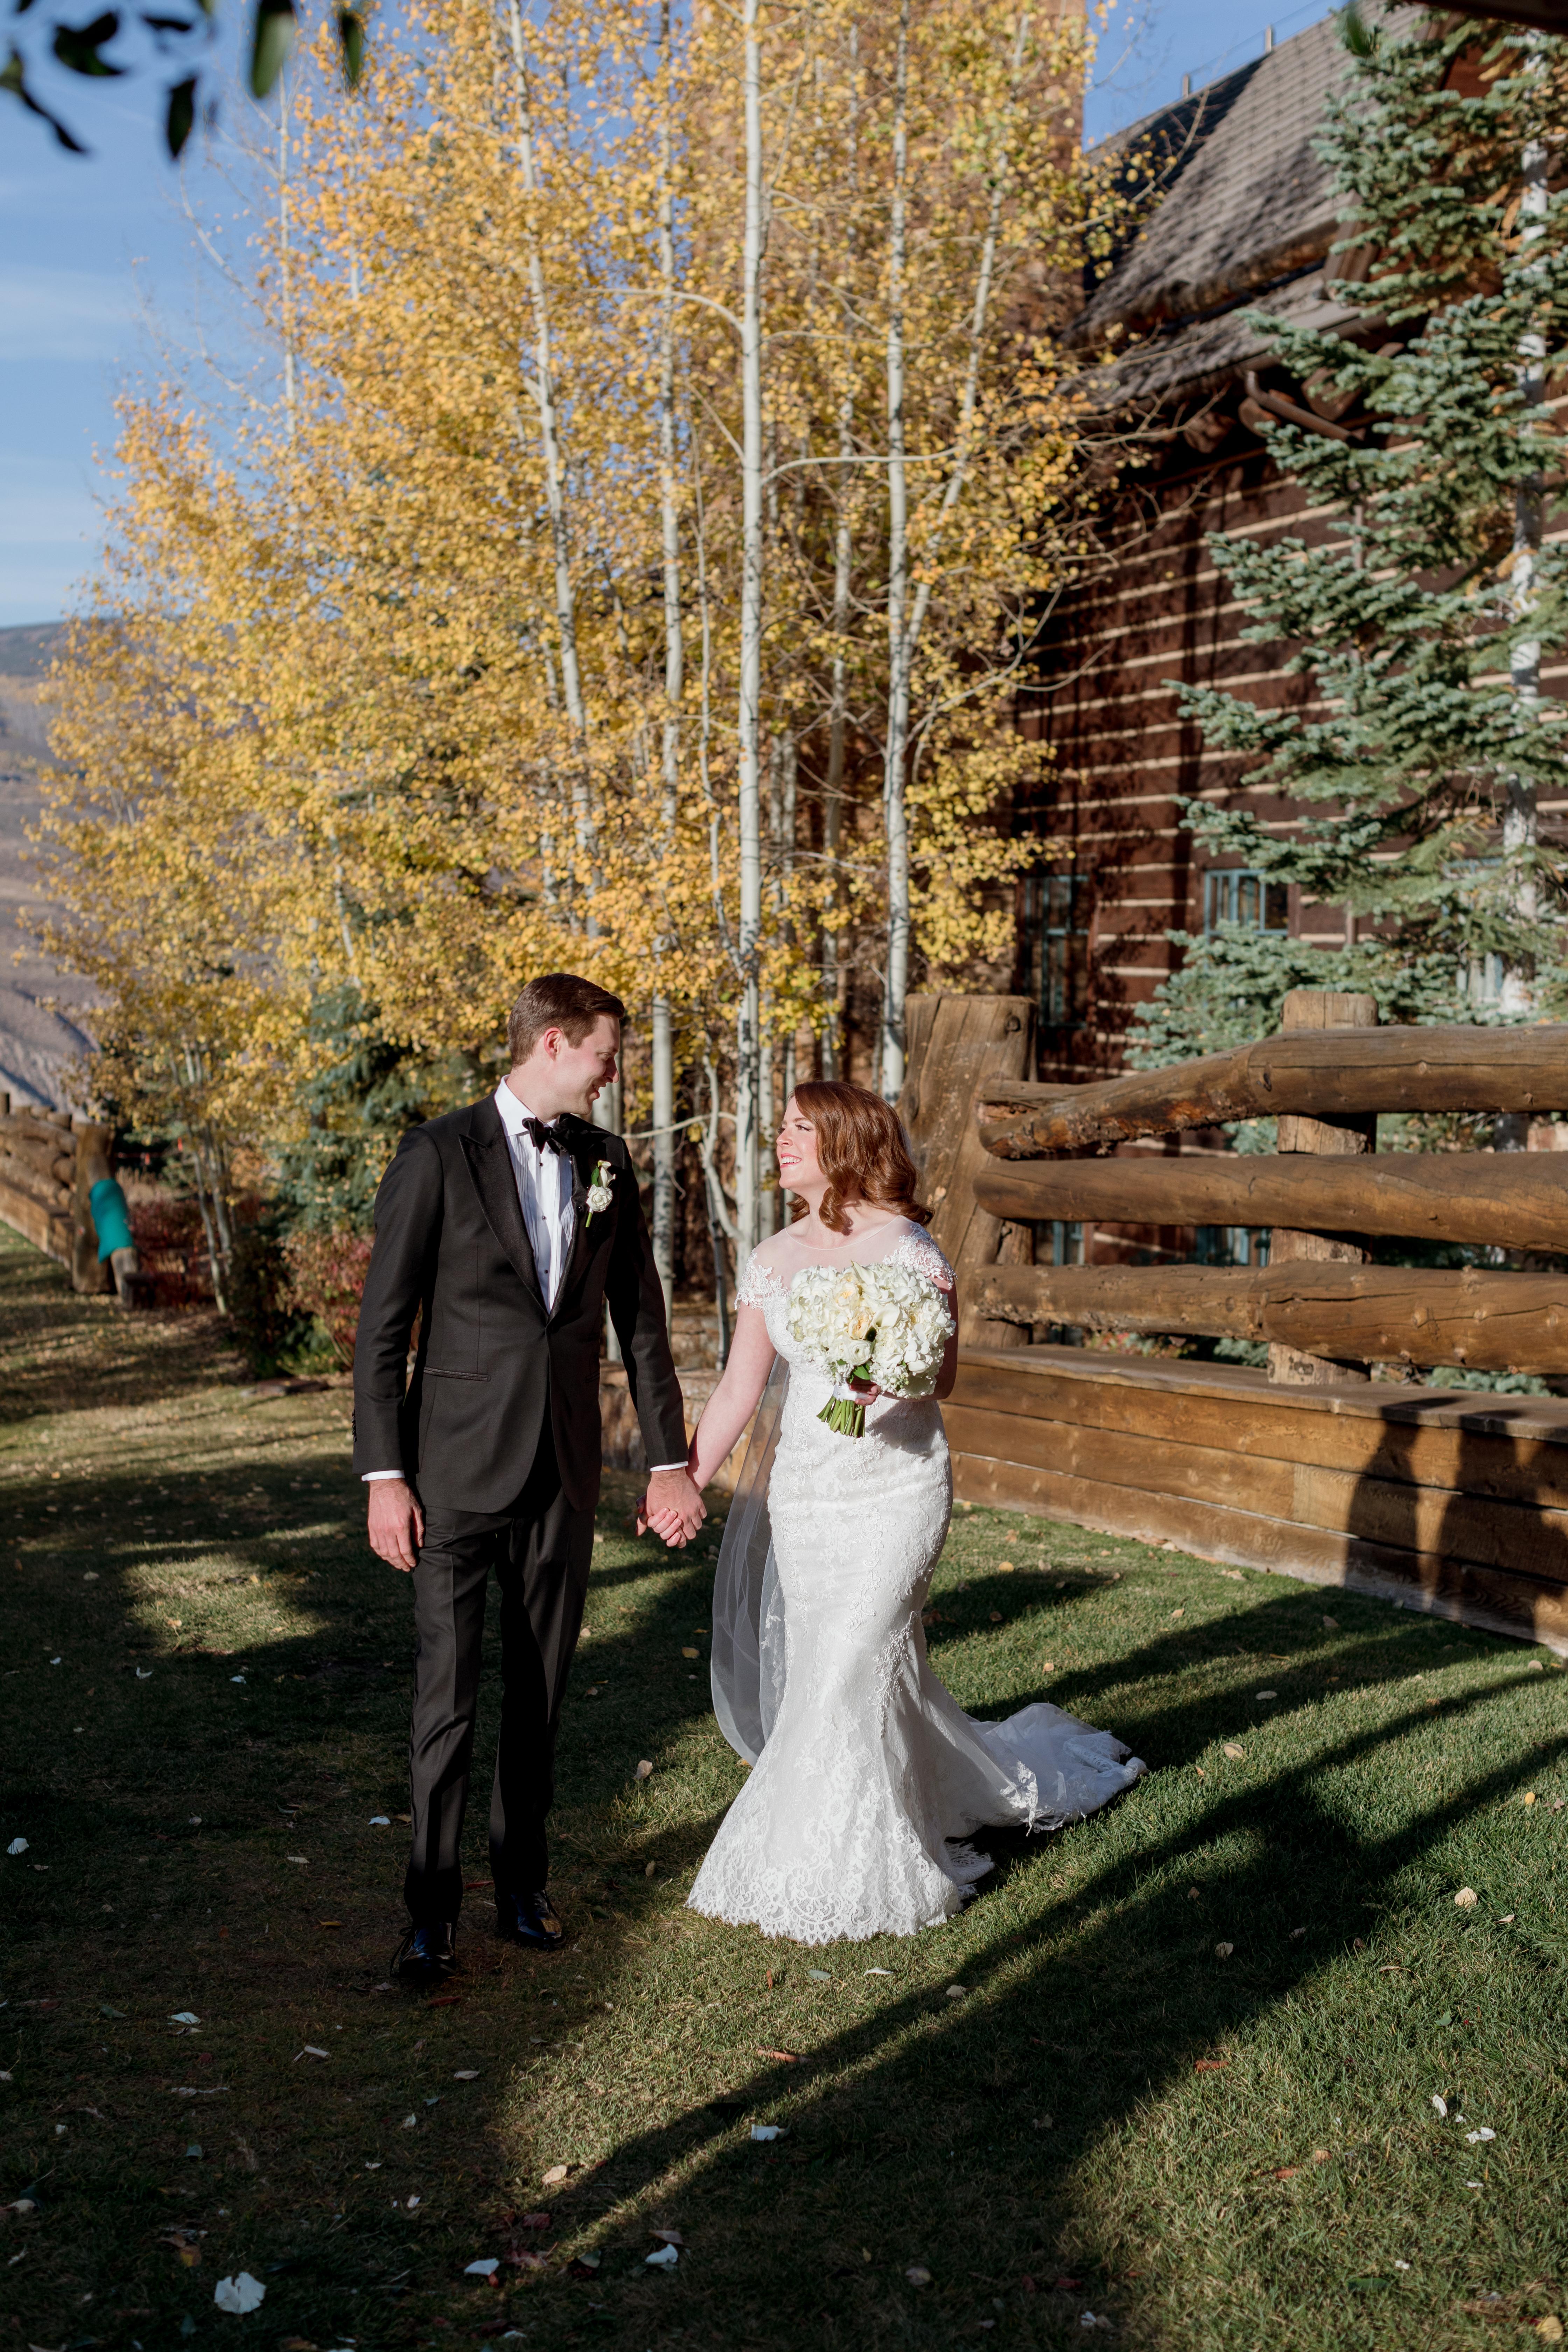 Ritz-Carlton-Bachelor-Gulch-Beaver-Creek-Colorado-Fall-Wedding-Bride-Groom-Skiers-Bridge